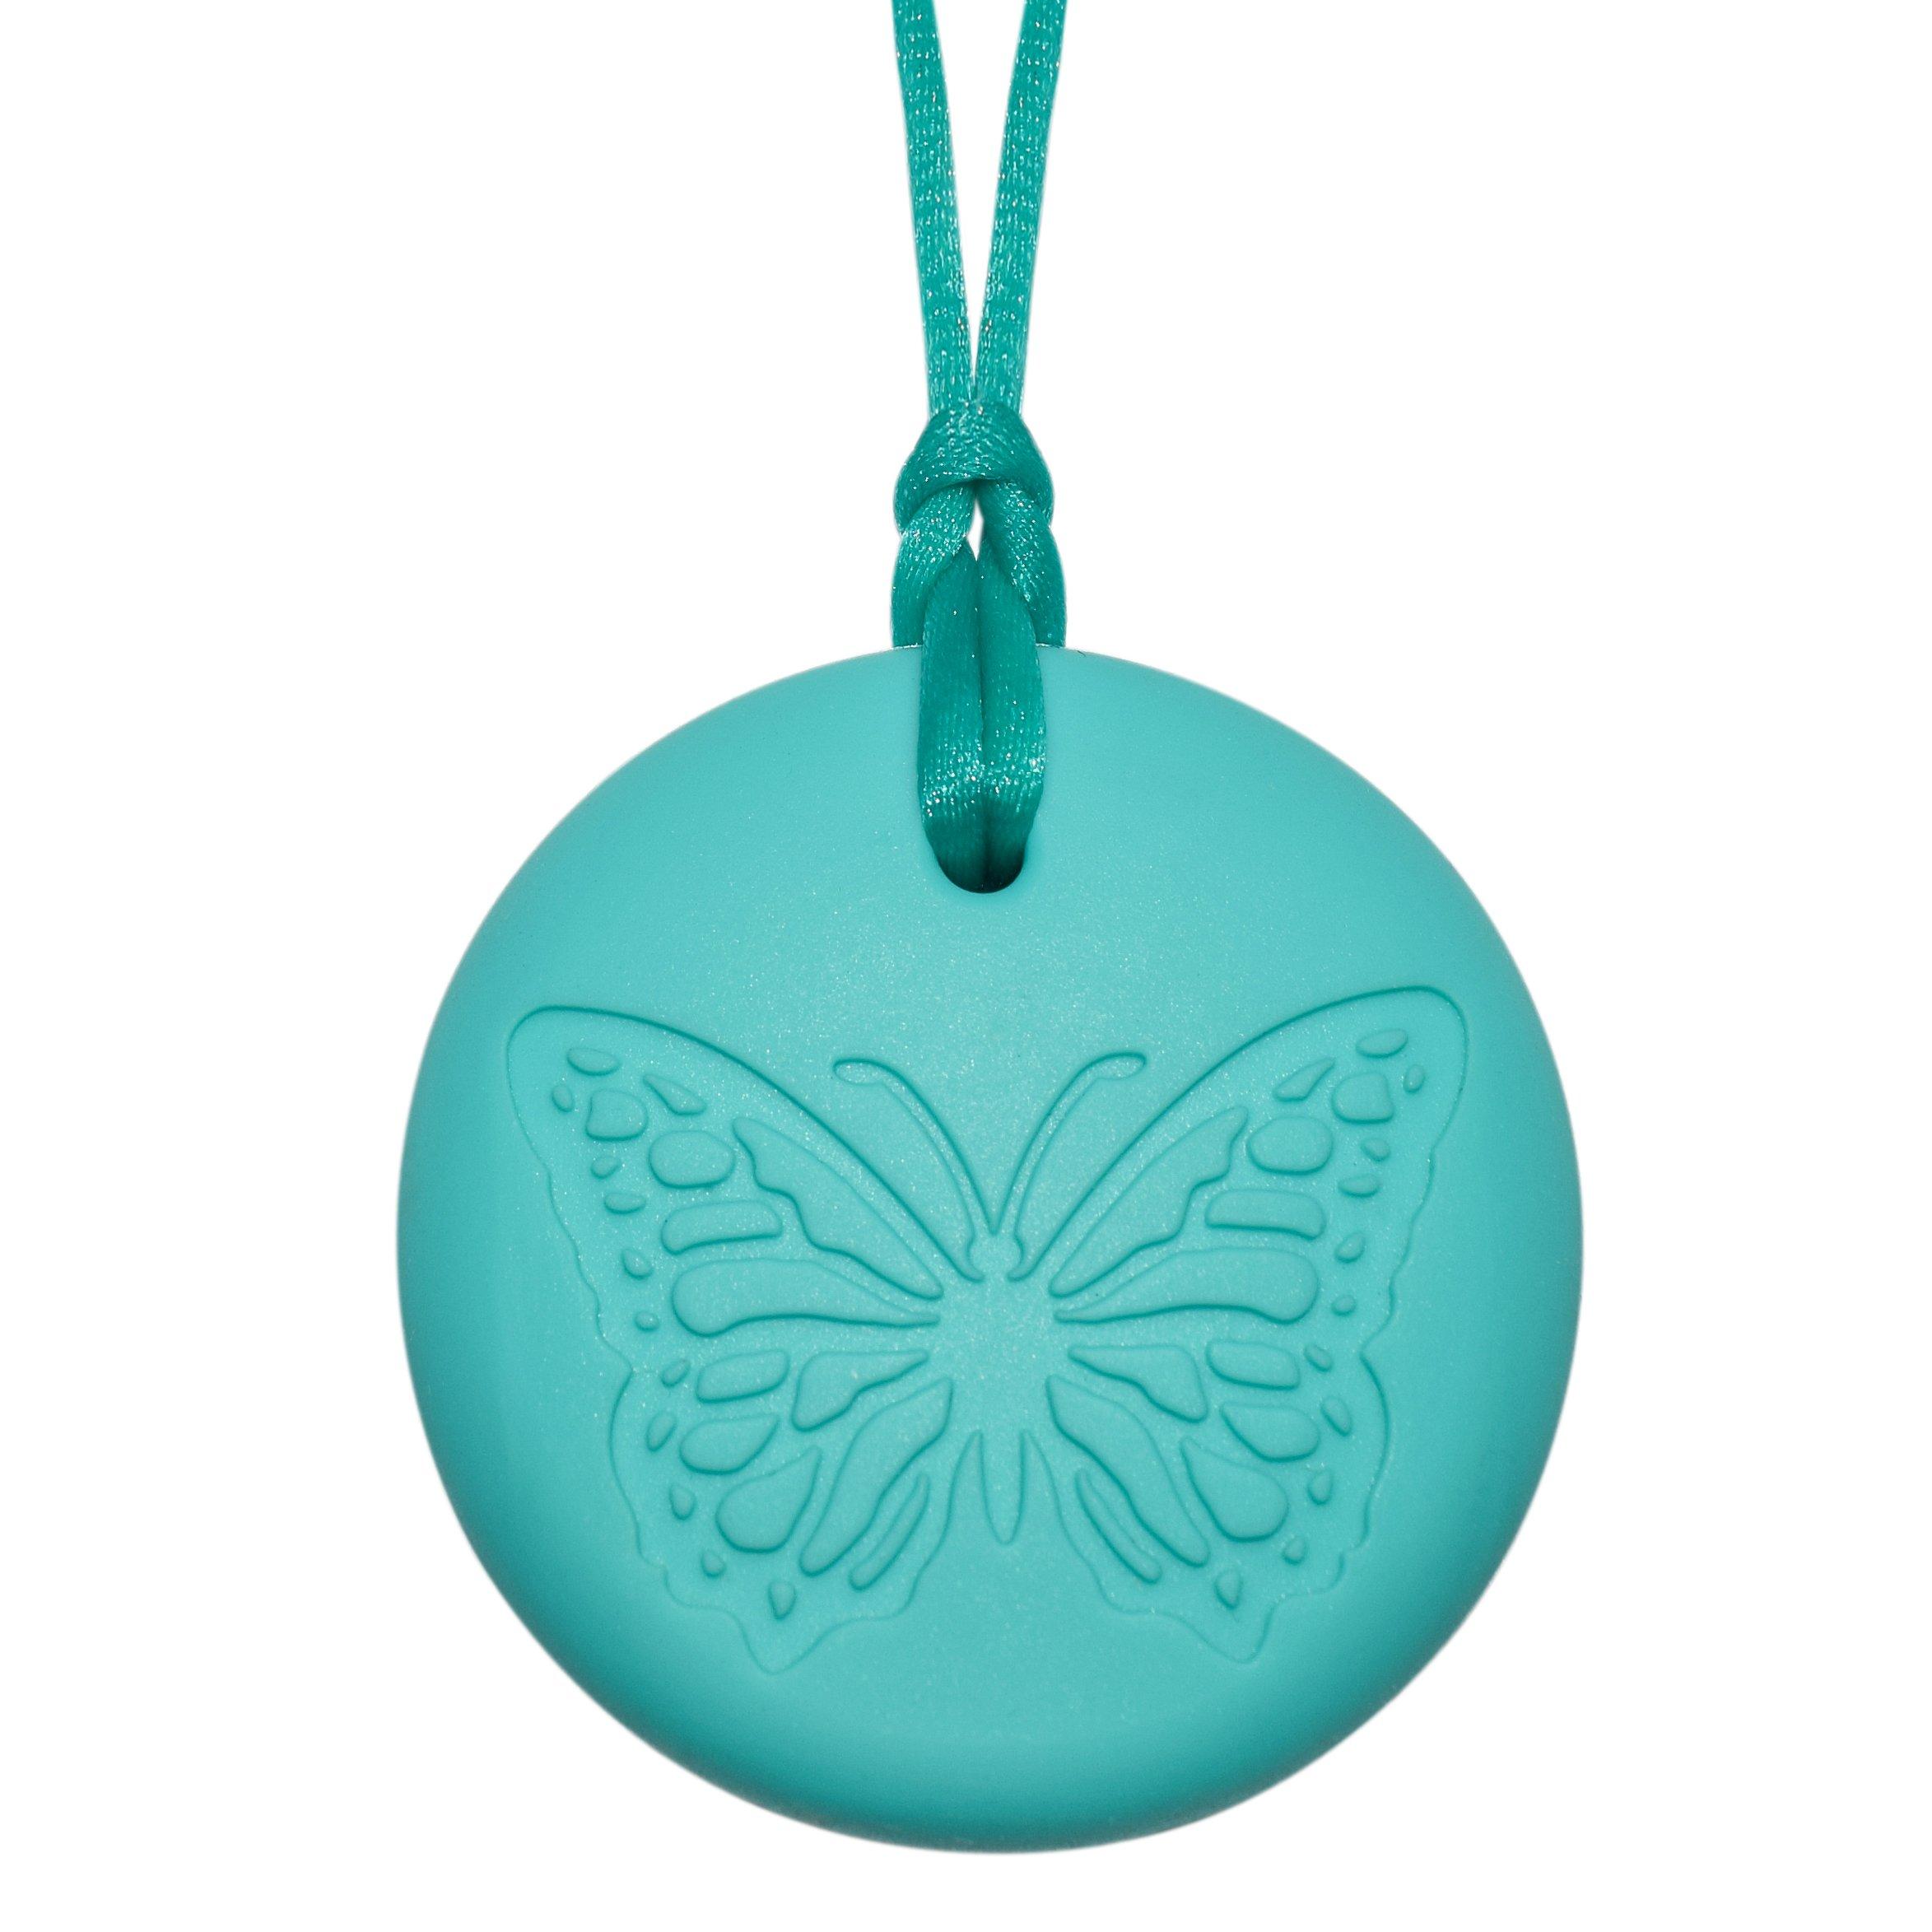 Butterfly Girls' Sensory Chewelry - Chewy Necklace (Aqua)